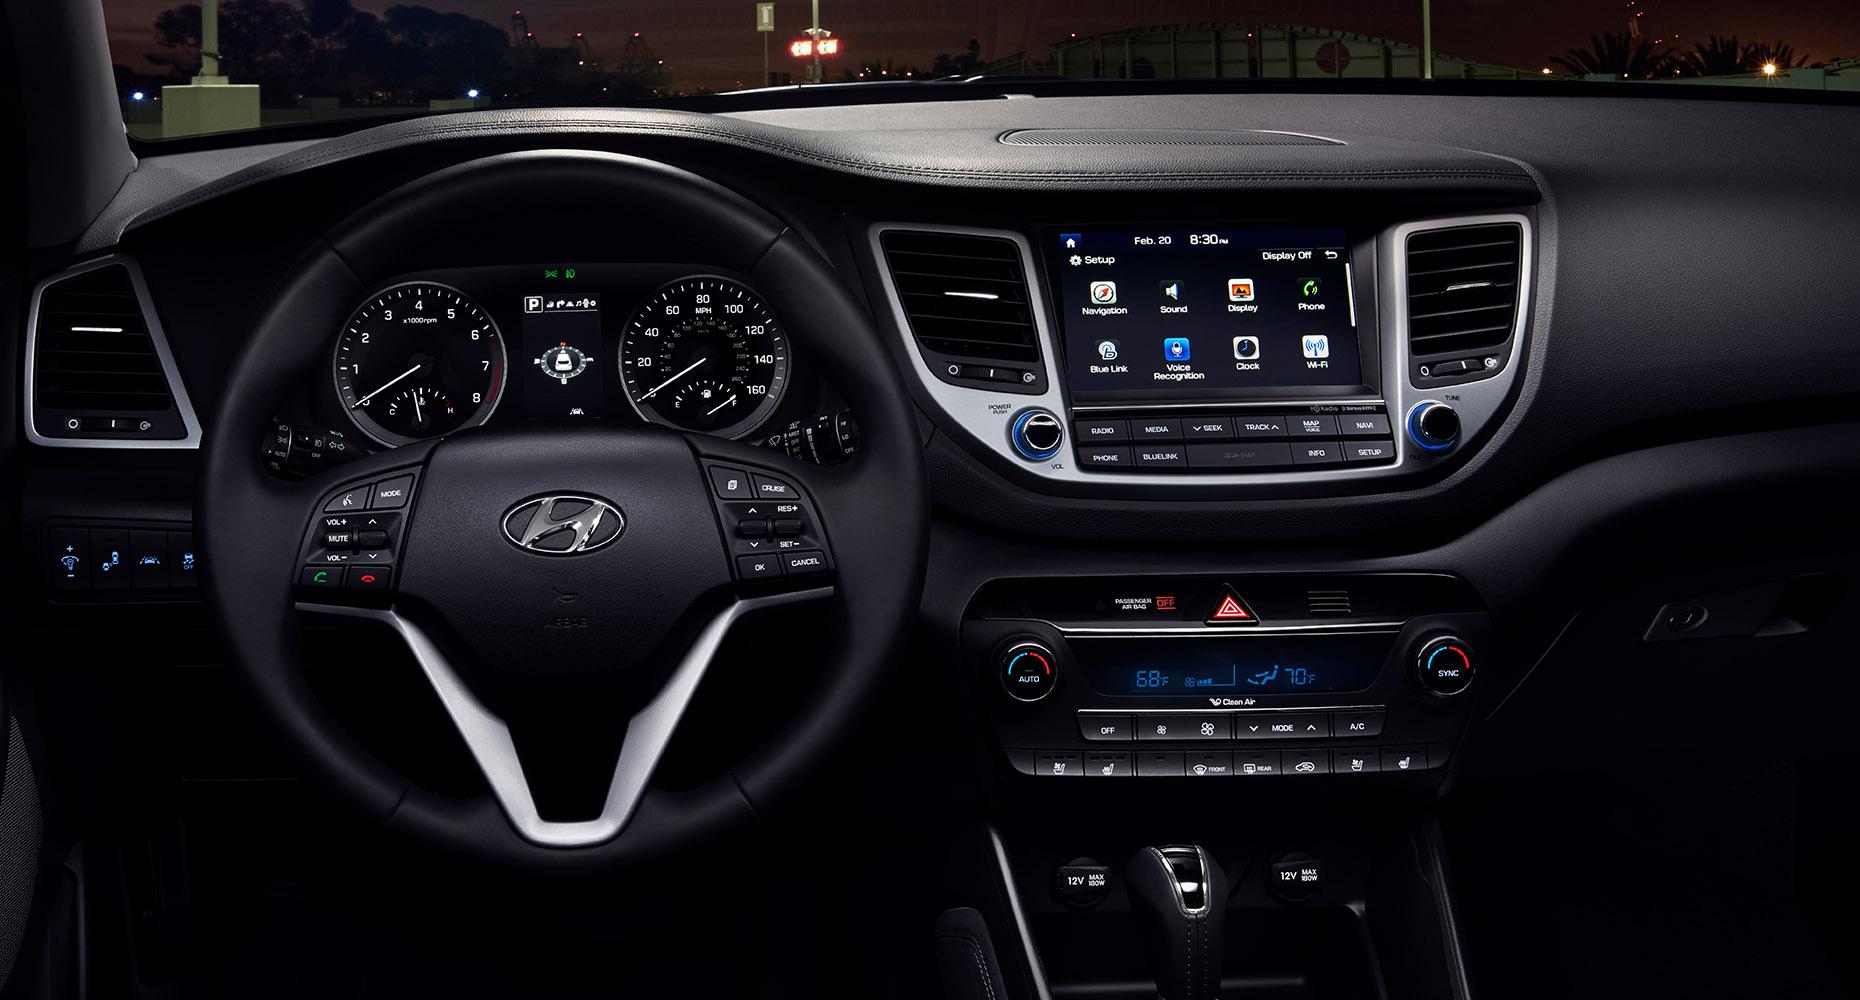 expert review used tuscon tucson of hyundai vehicle